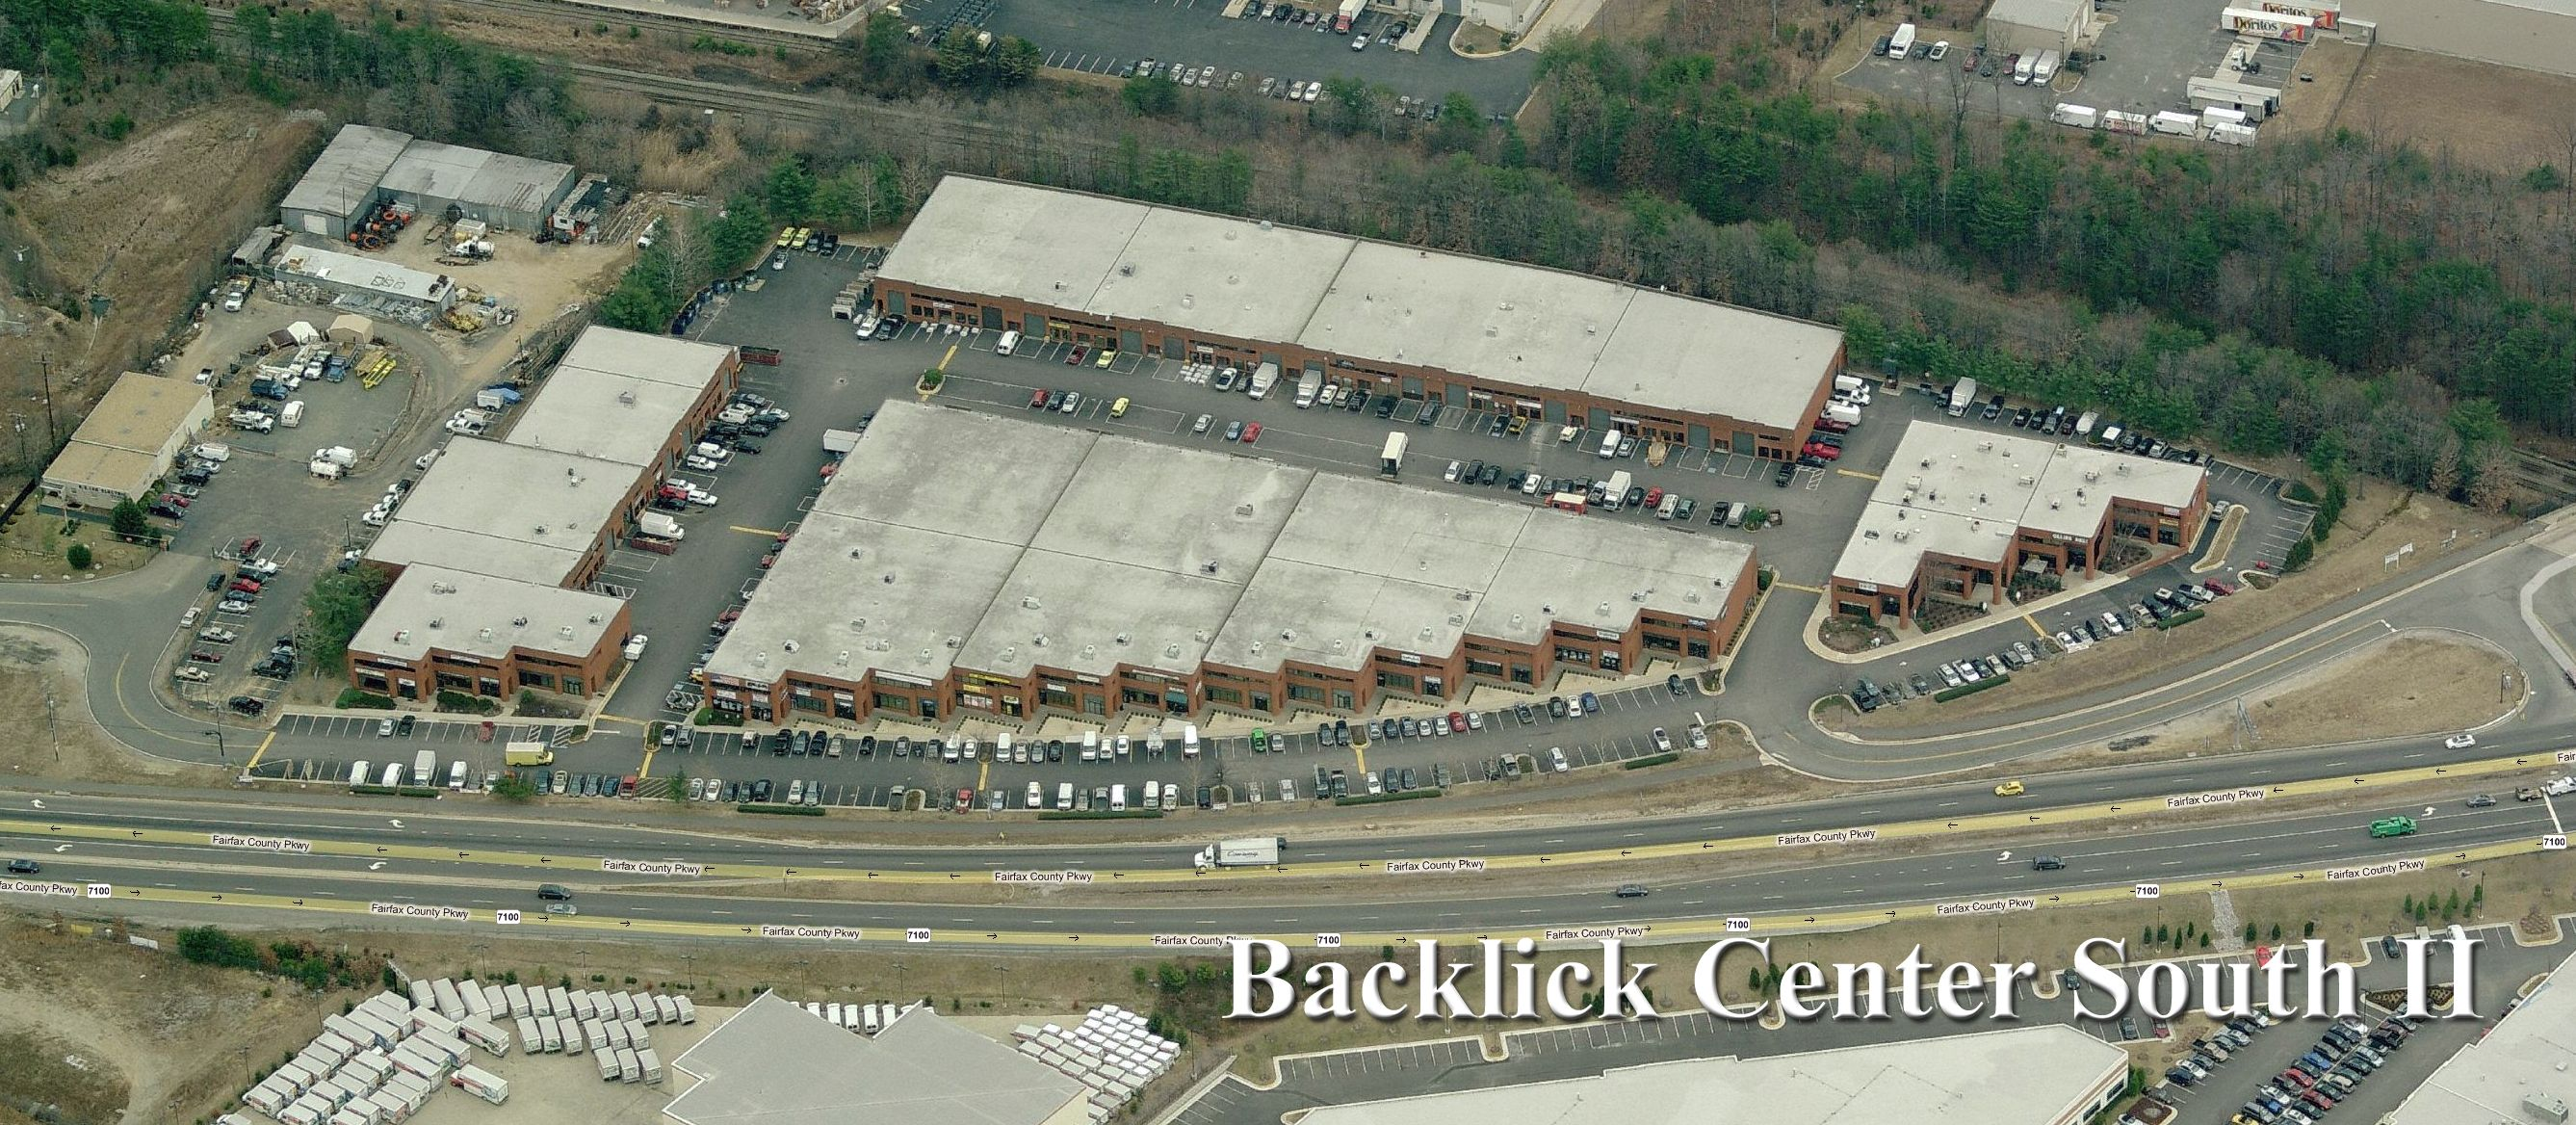 Backlick center south ii 82418253 backlick road lorton